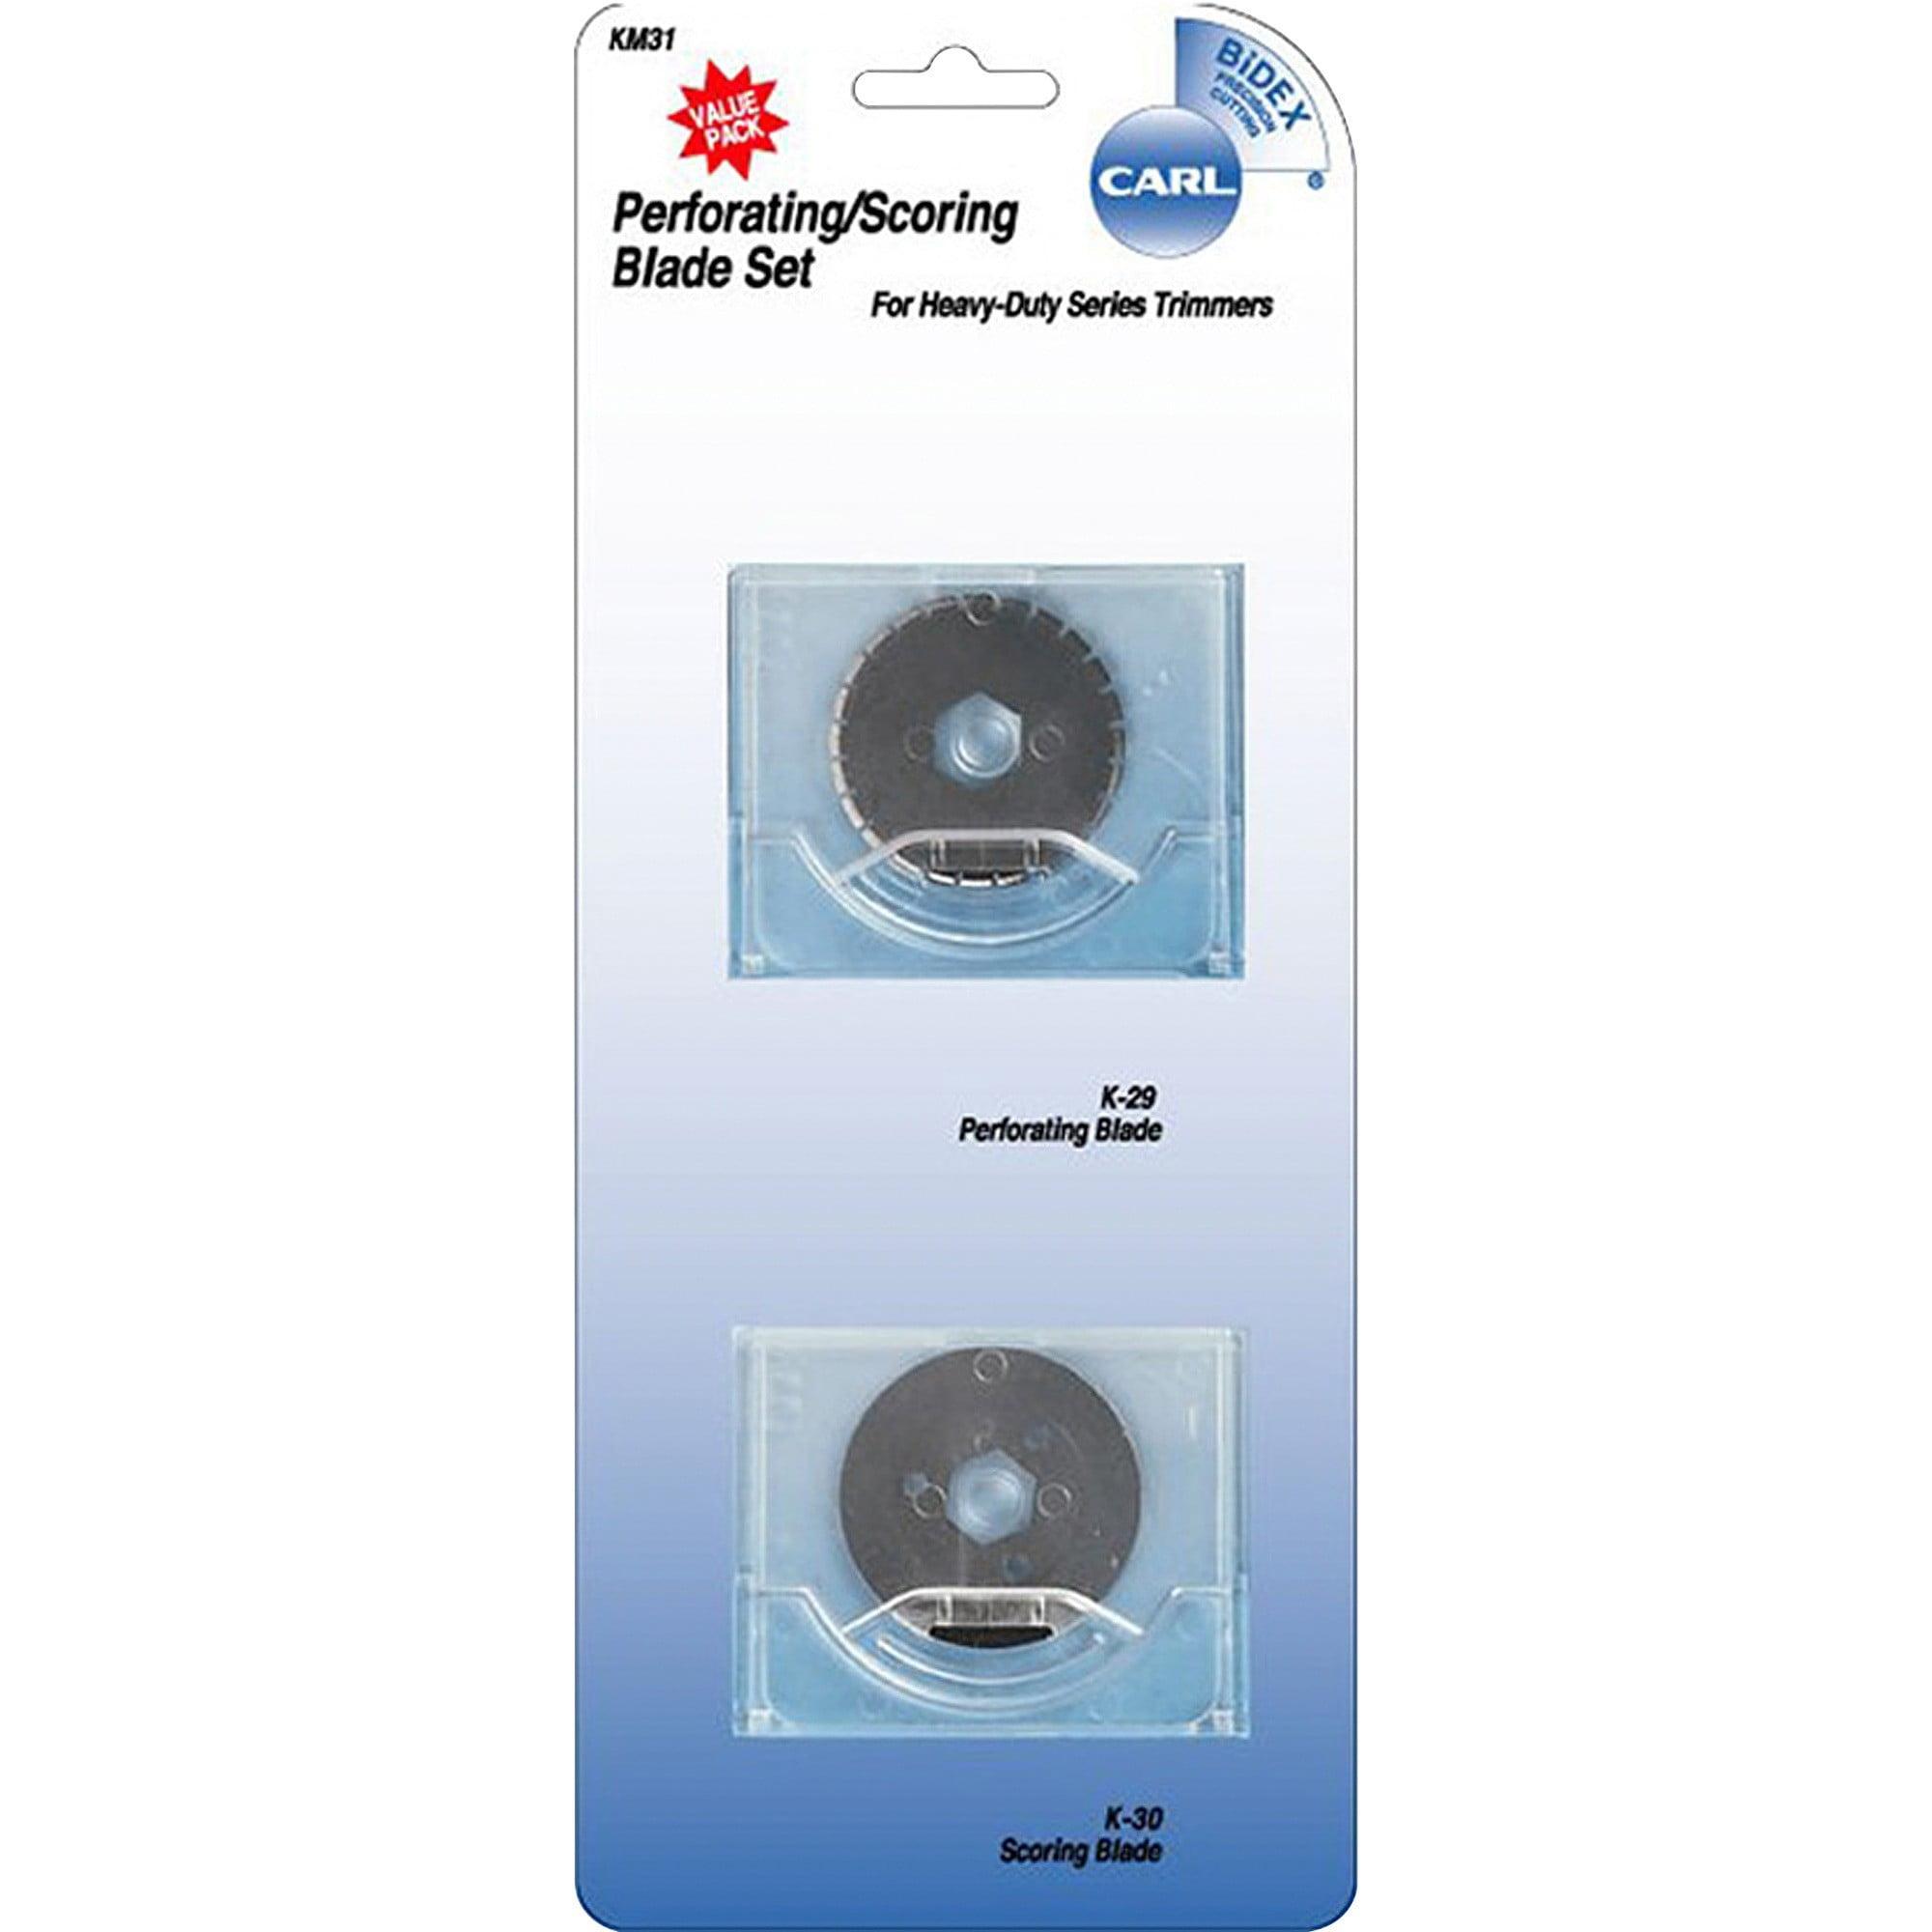 CARL Perforating/Scoring Replacement Blades (cui-14031)